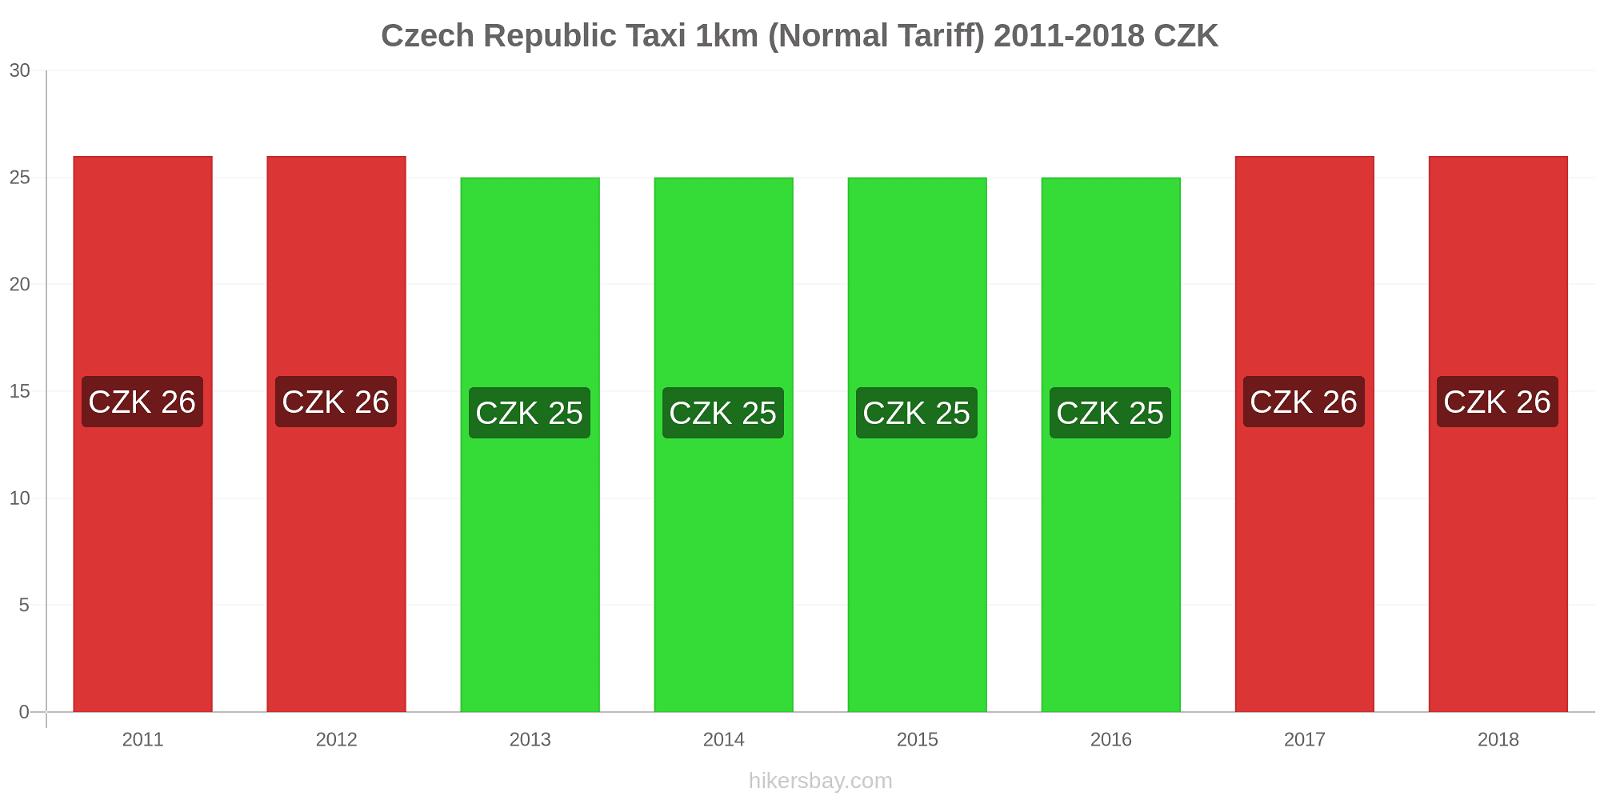 Czech Republic price changes Taxi 1km (Normal Tariff) hikersbay.com